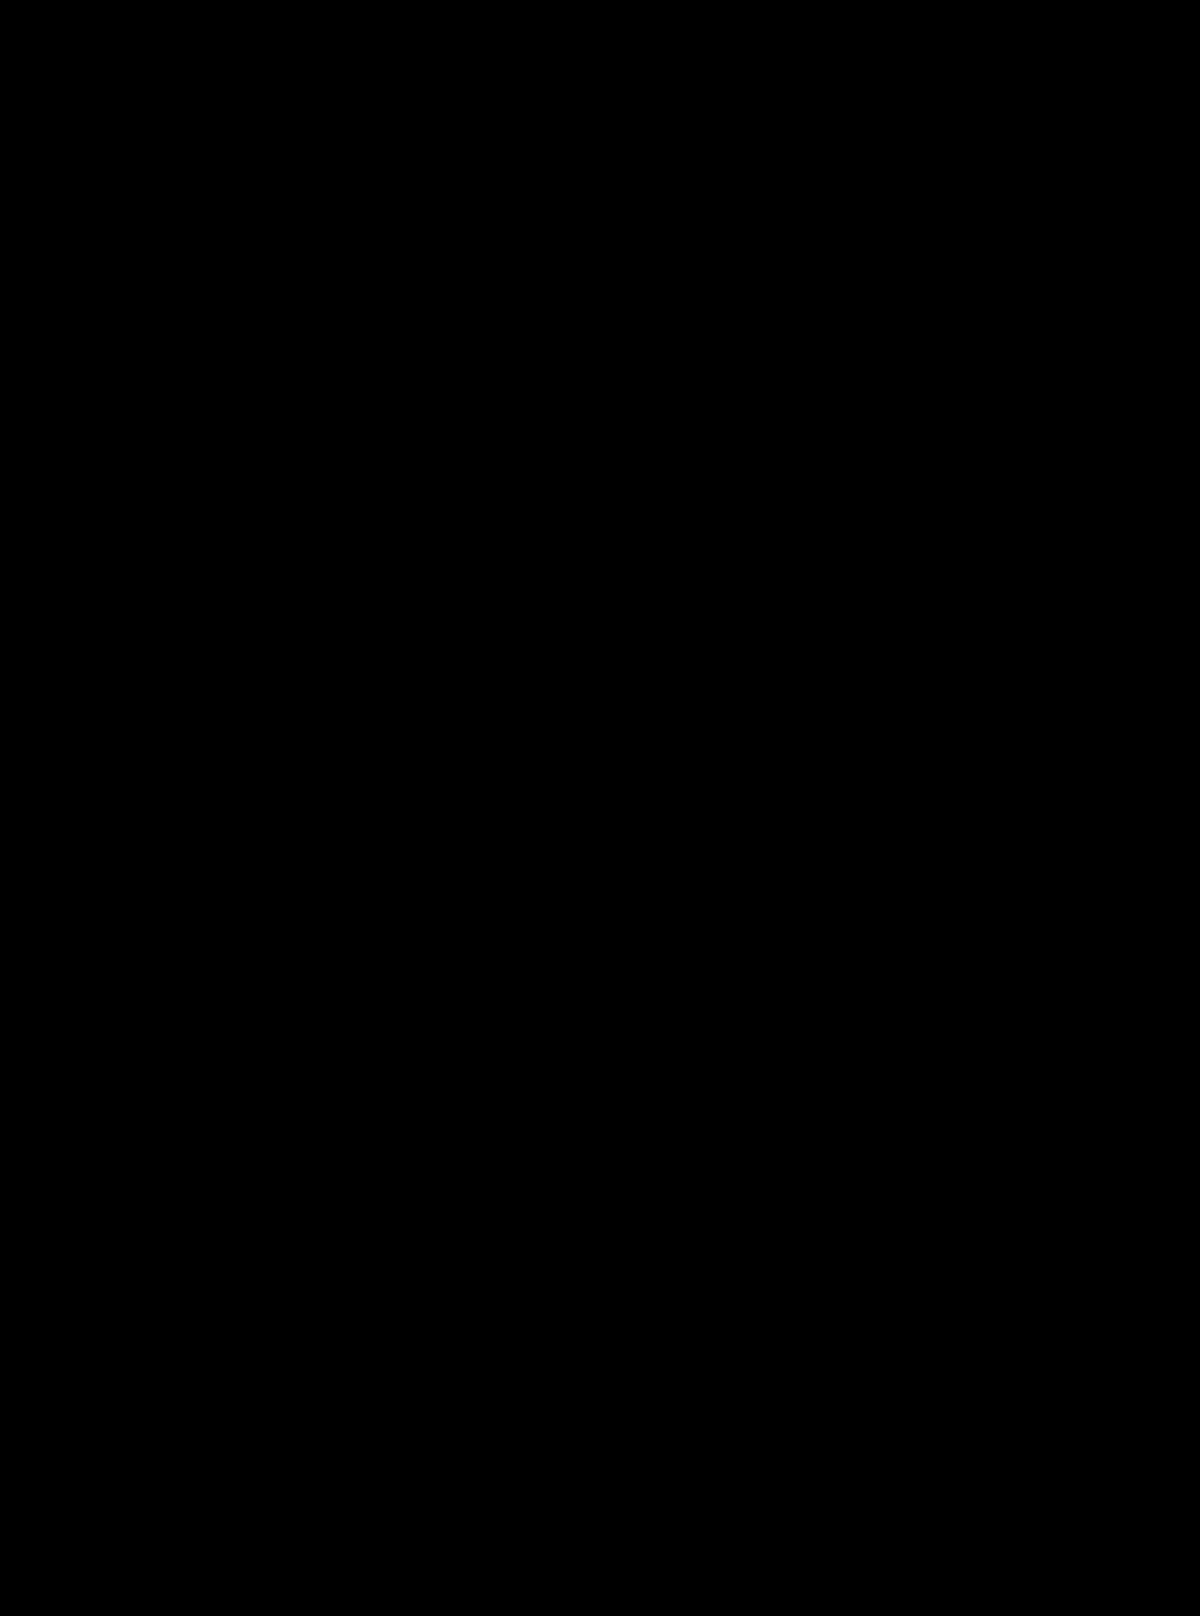 Sec-Butyl Benzene (SBB)